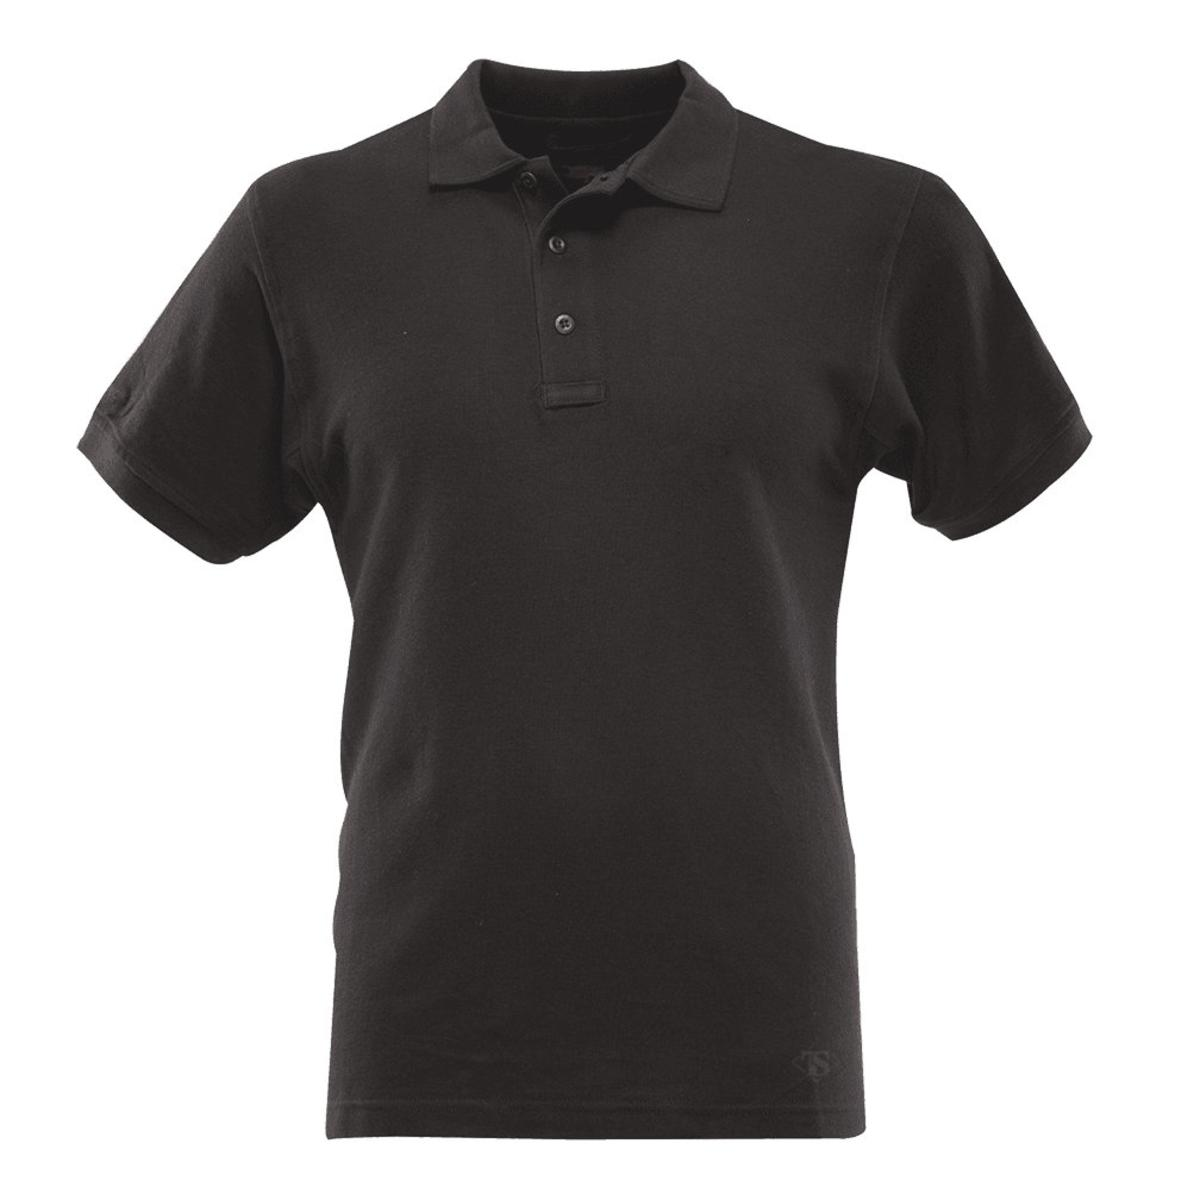 Tru-Spec Womens 24-7 Classic Cotton Short Sleeve Polo Shirt